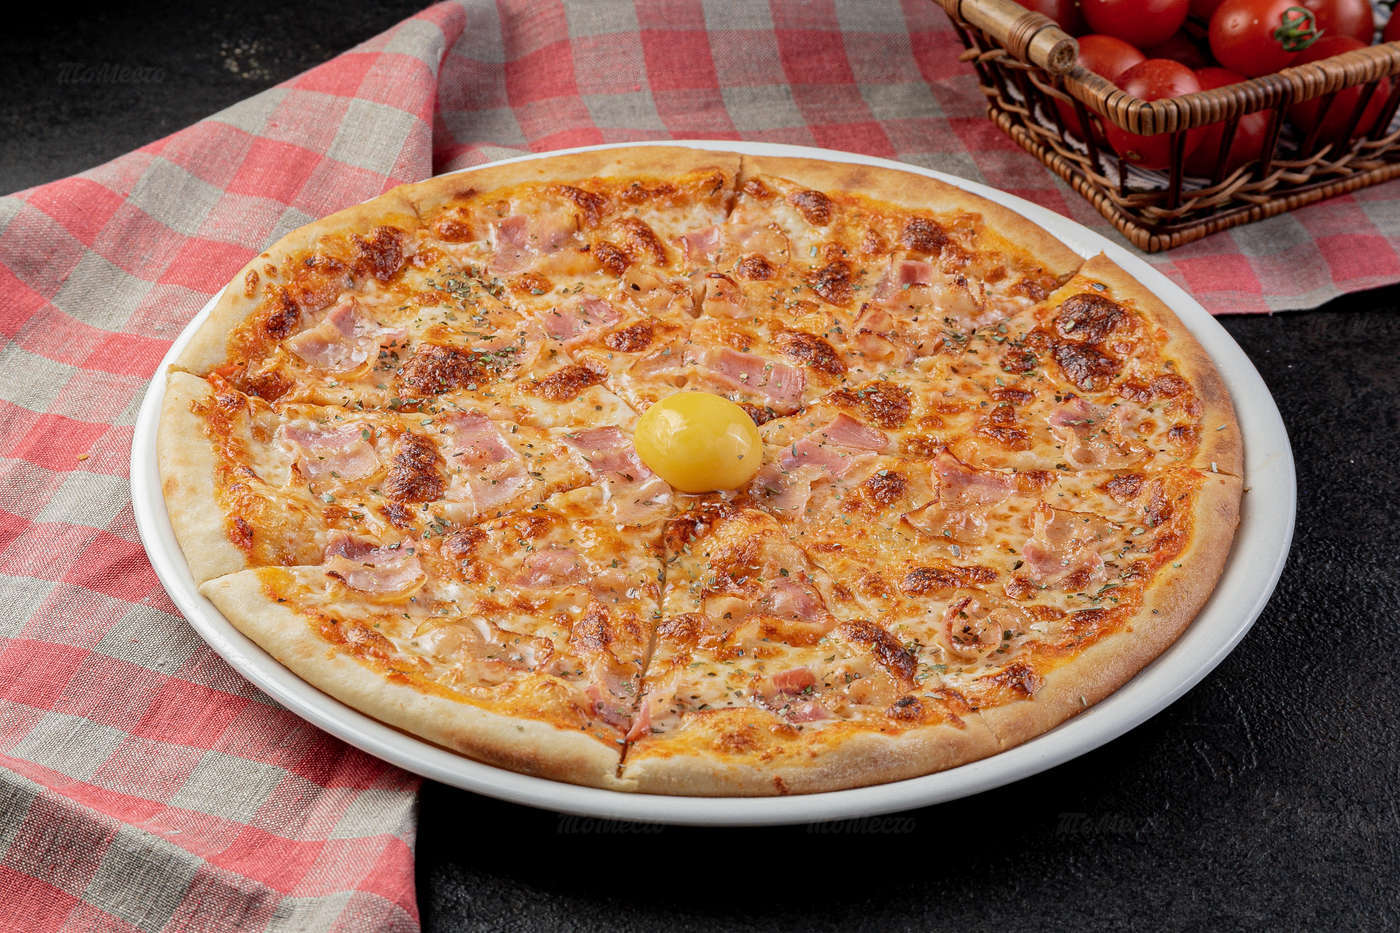 Меню ресторана Папа Пицциано (Papa Pizziano) на Новочеркасском проспекте фото 34